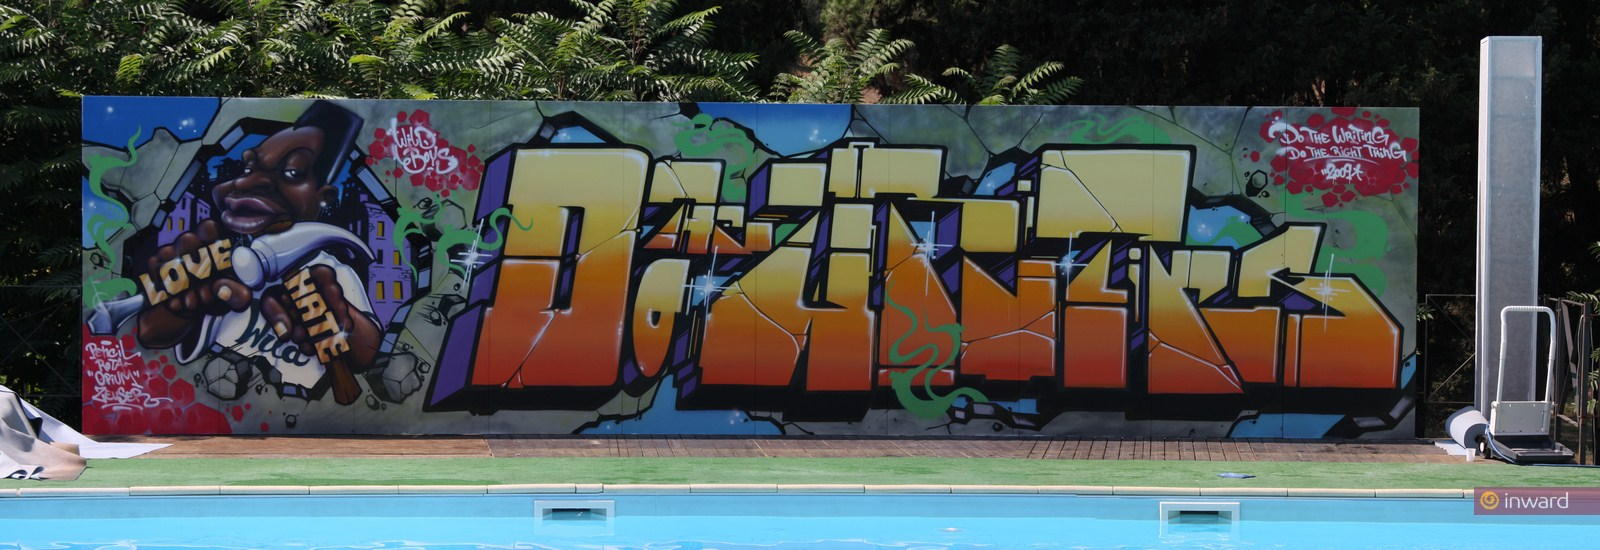 Creatività urbana ad Atreju, 2009 e 2011